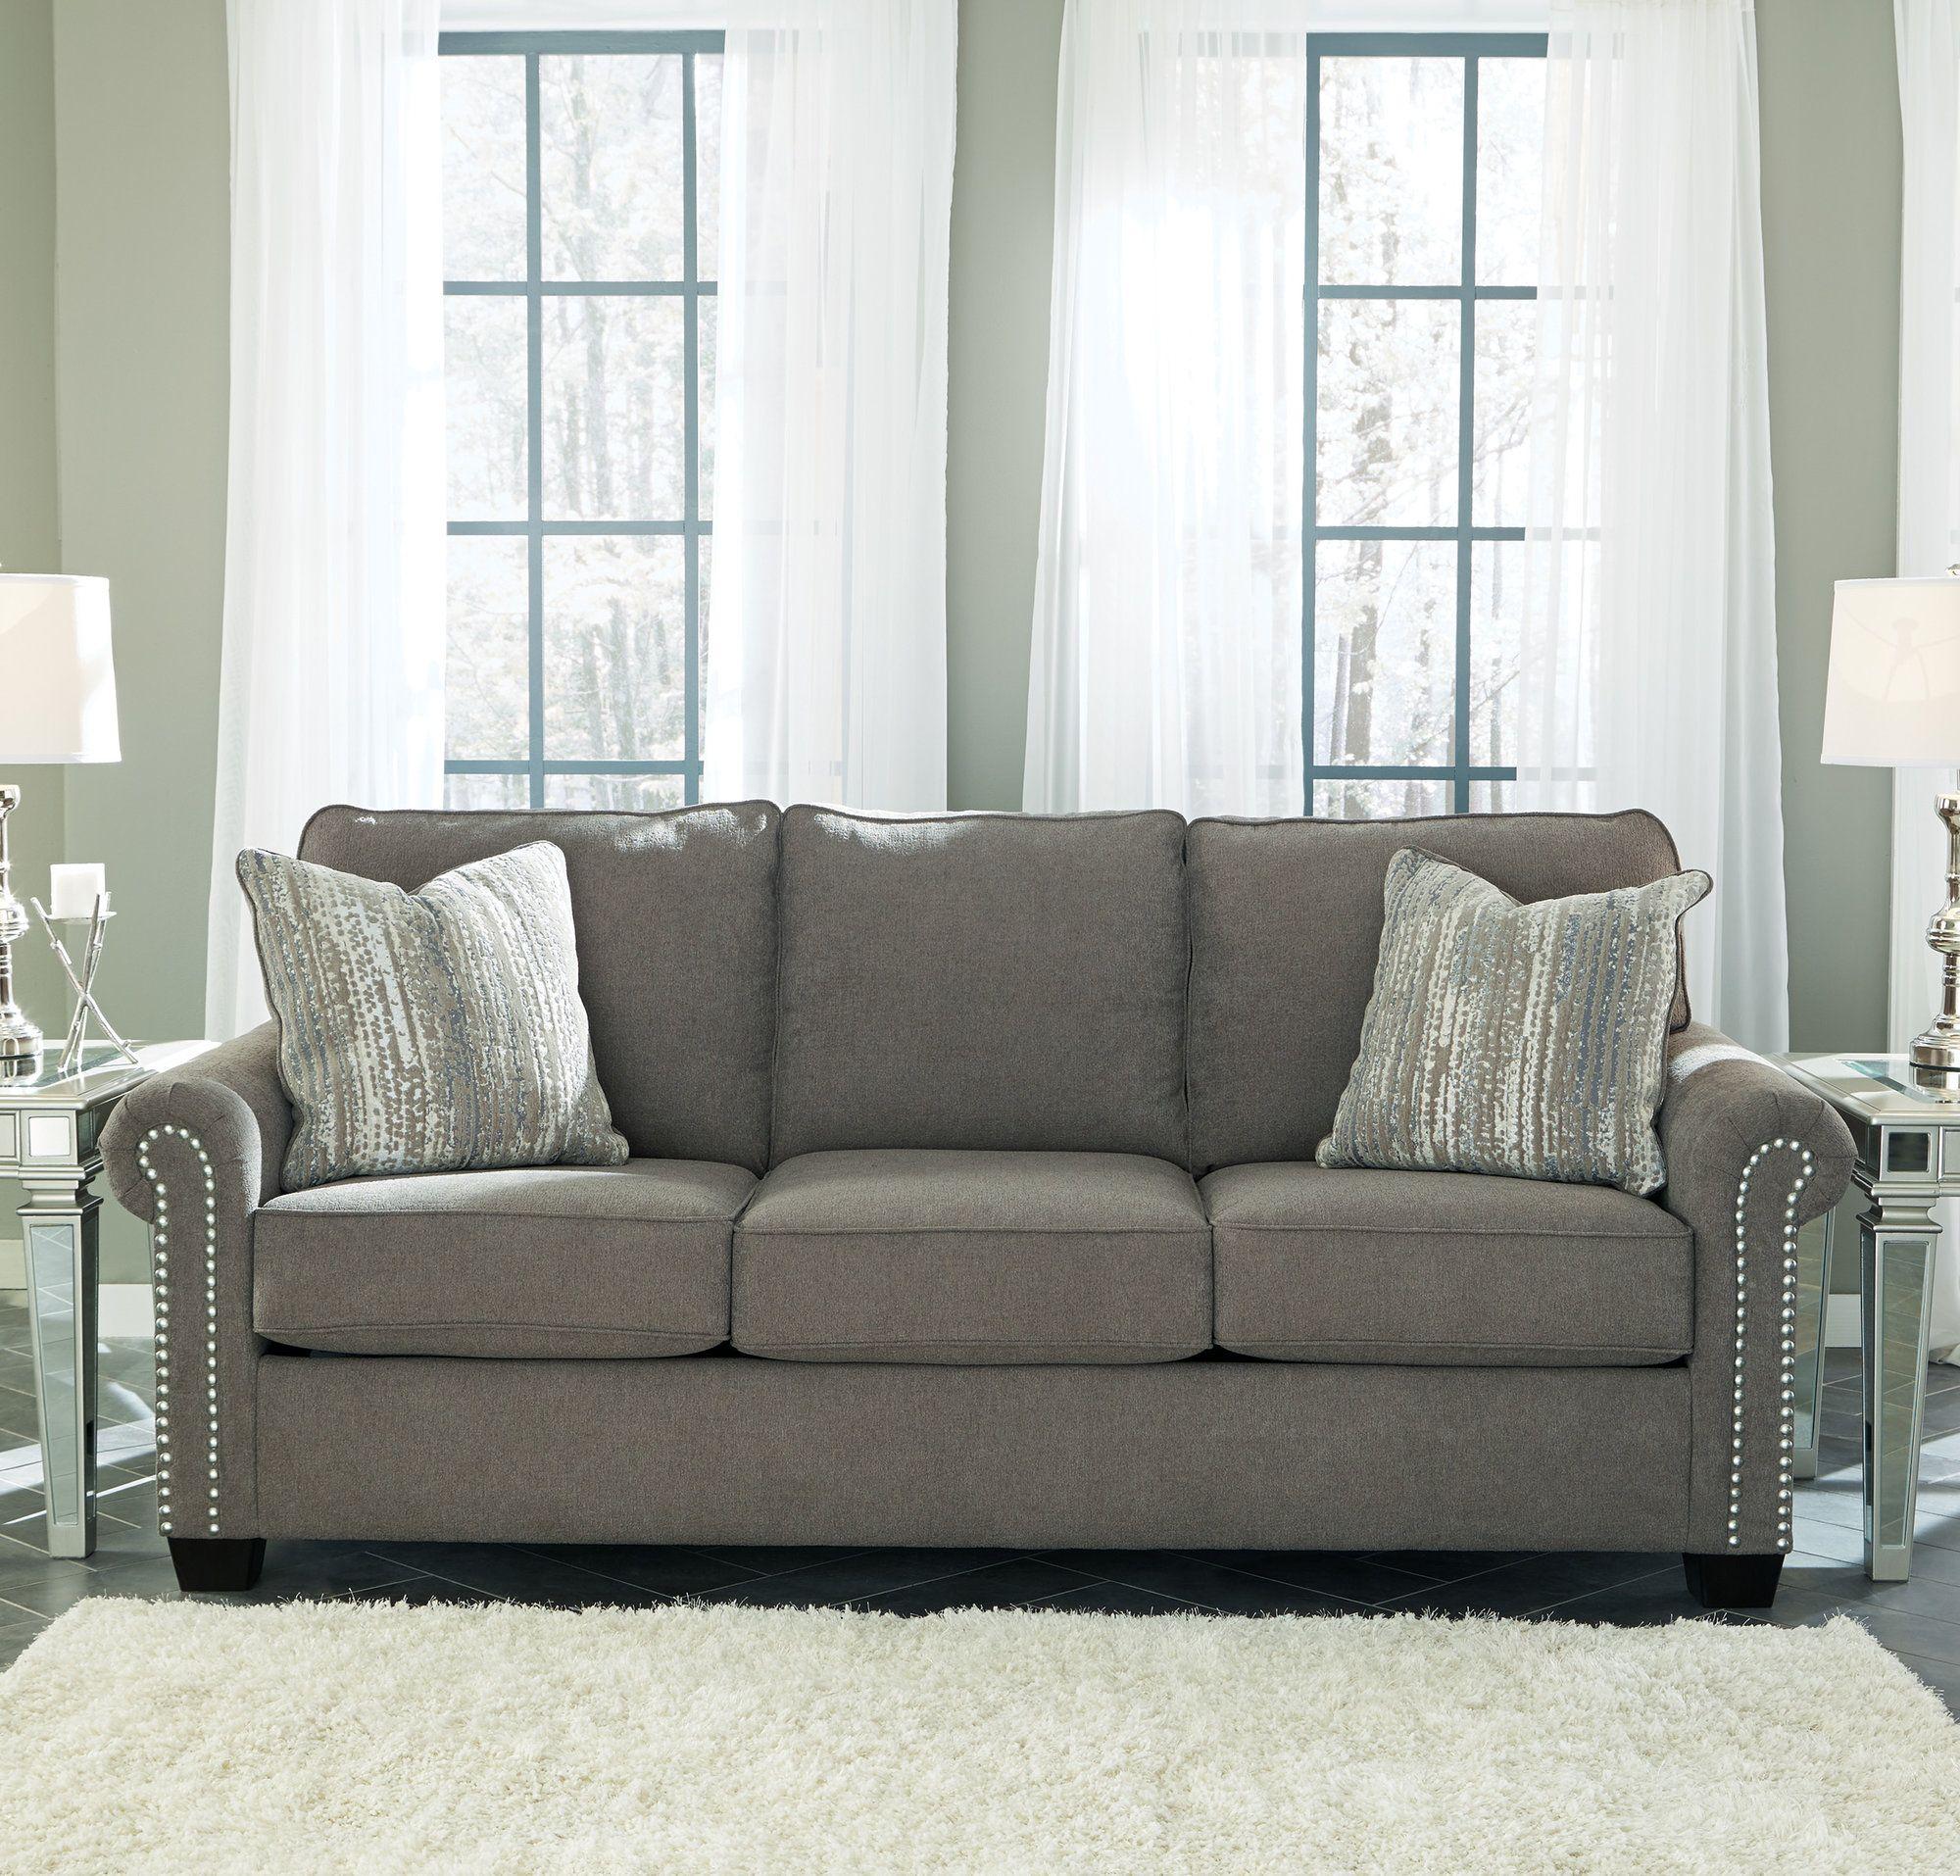 Slate Nalini Sofa View 1 Apartment Decor Pinterest